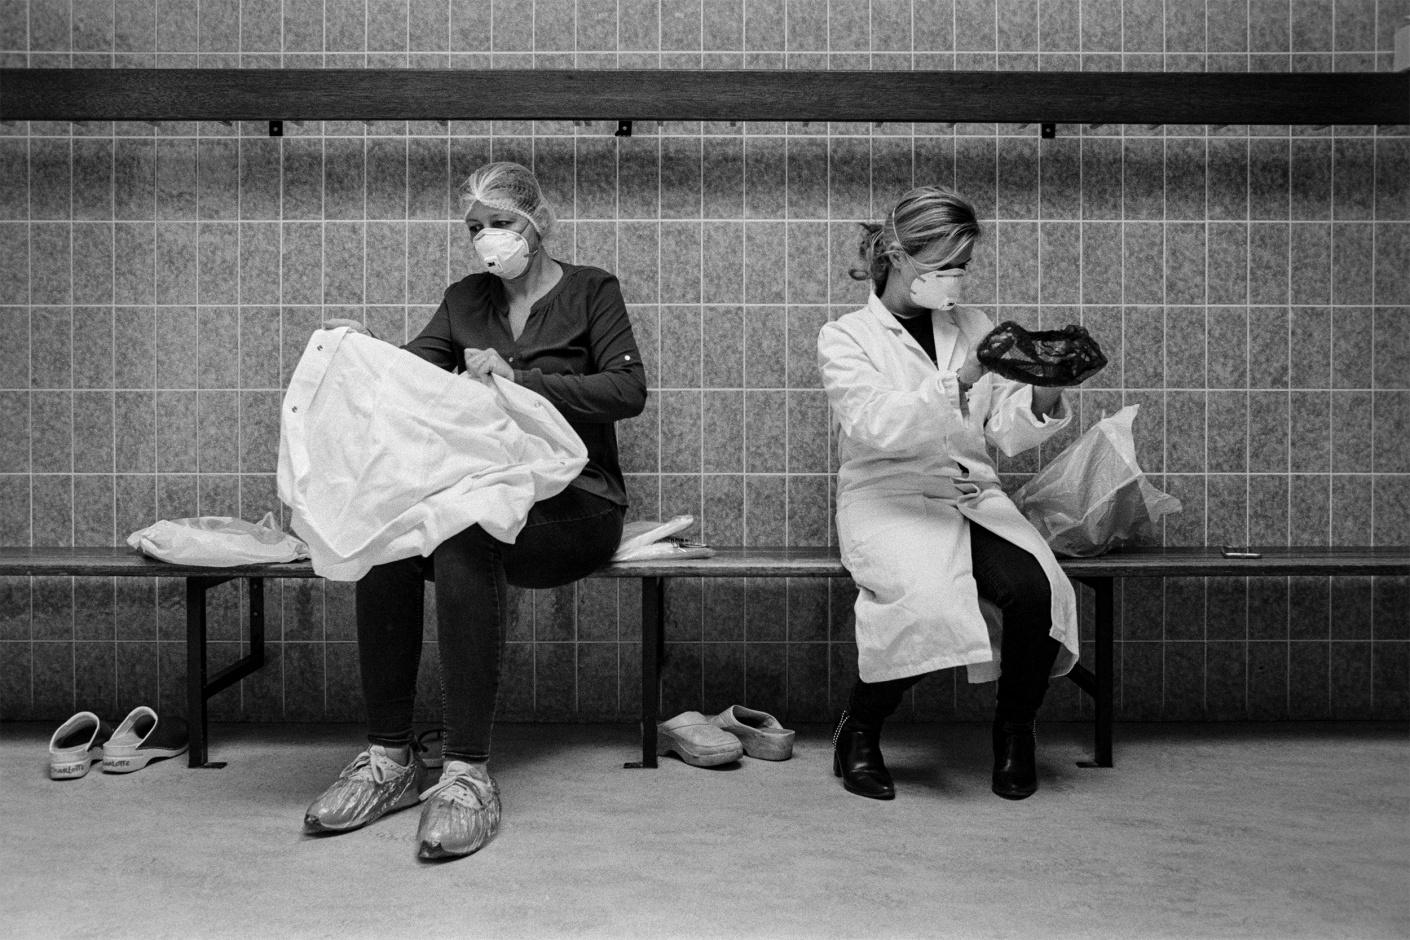 OPPENHEIM | CORONA | COVID | Jelle Pieter de Boer